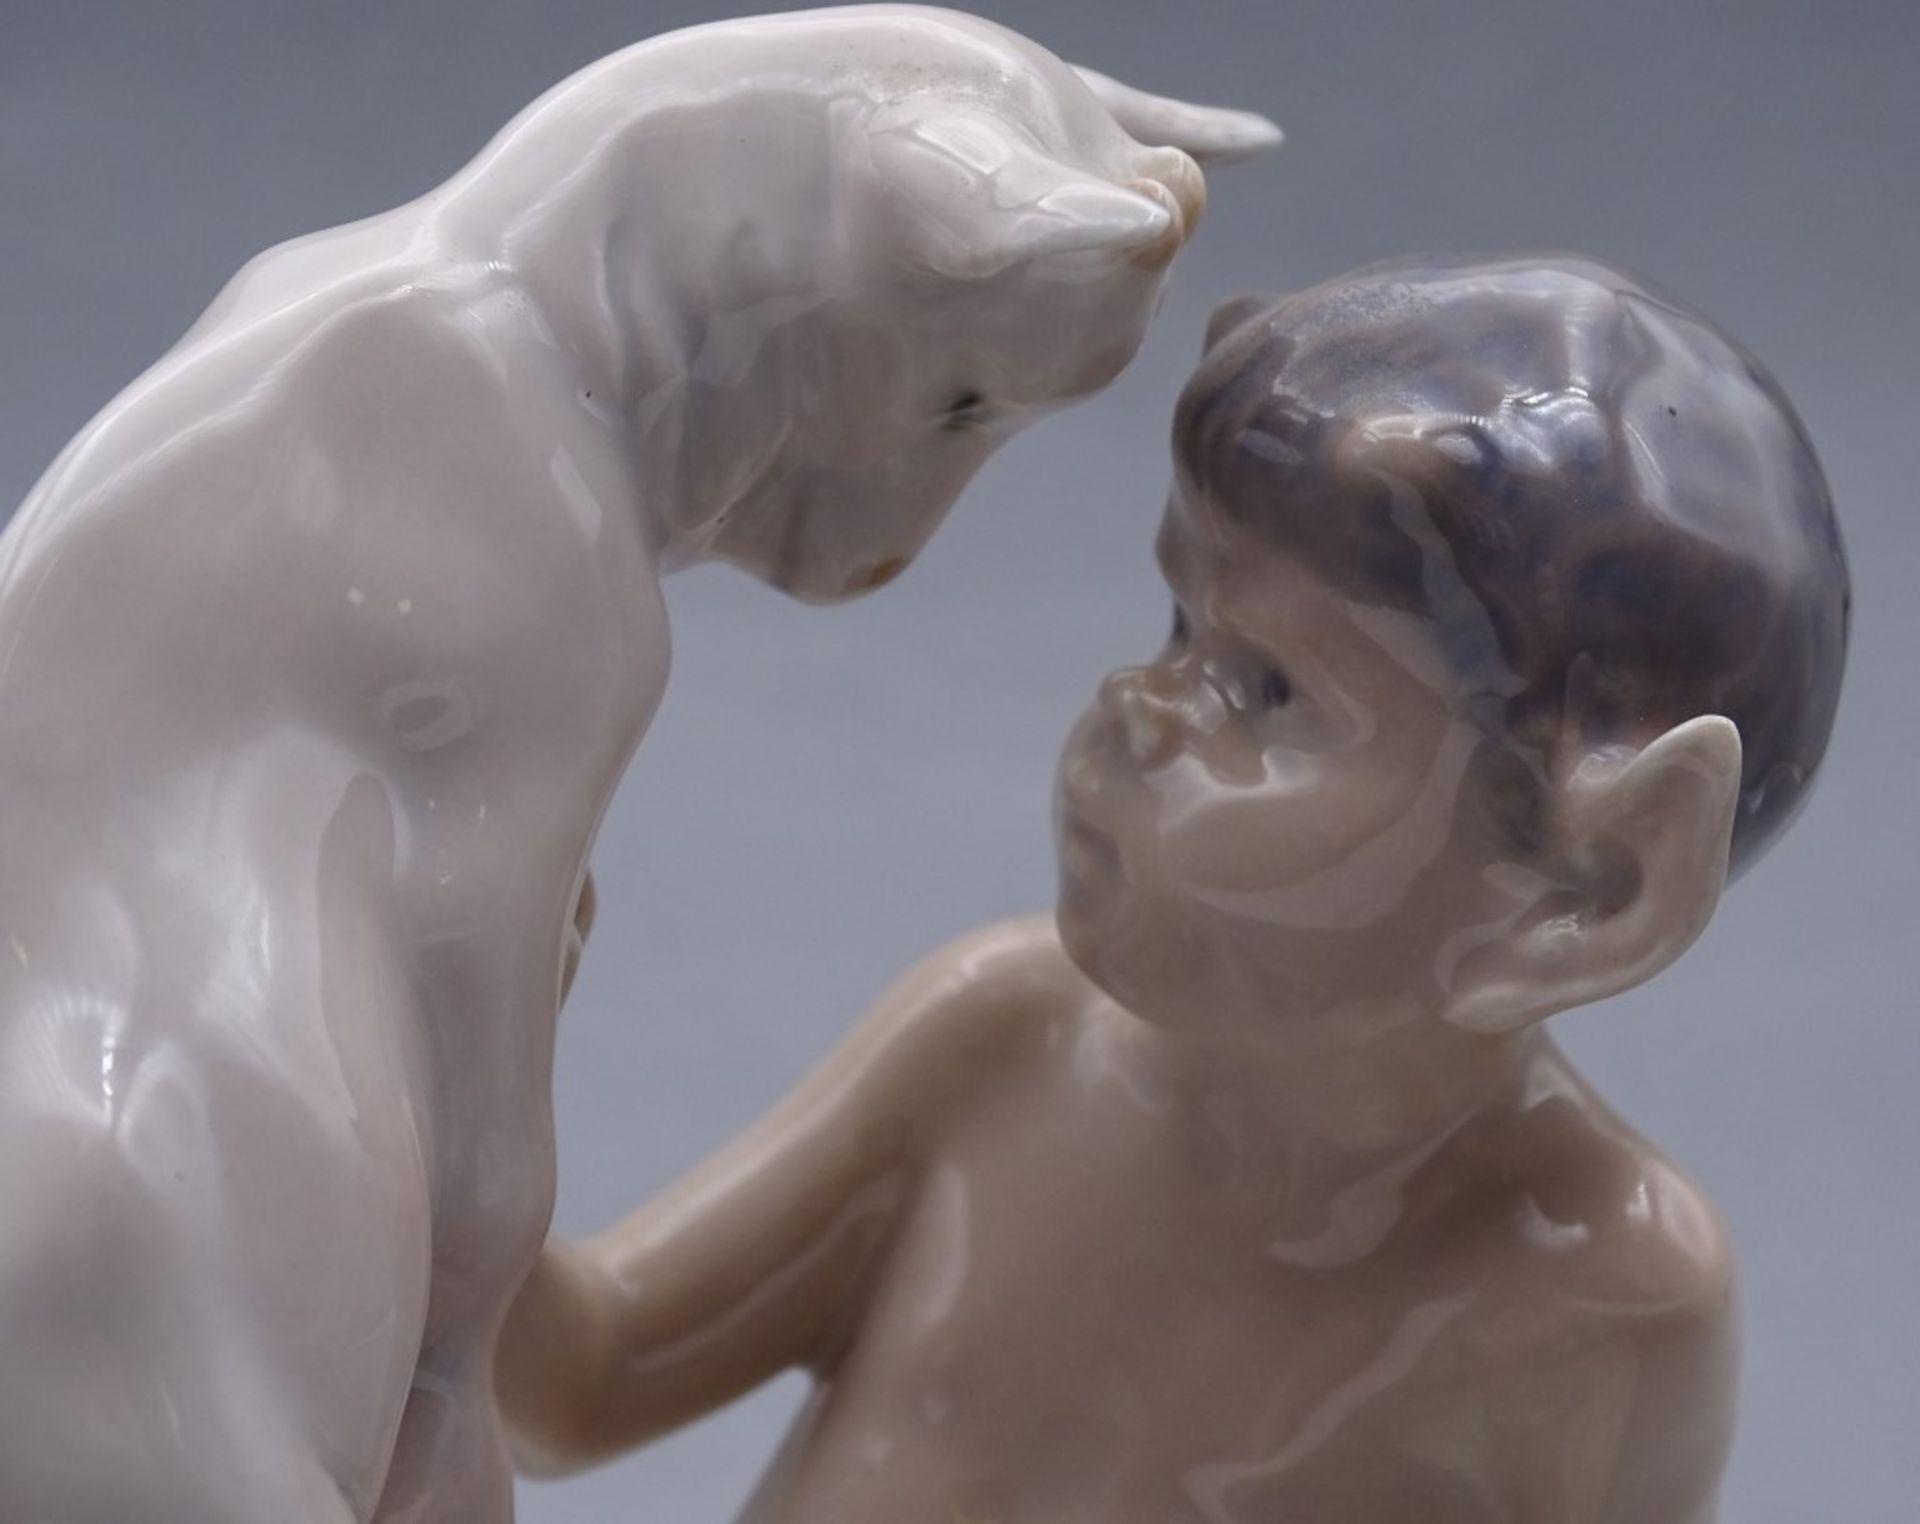 "Los 1040 - Porzellan-Figur Faun mit Zicklein ""Royal Copenhagen"" Dänemark, Entw.: Christian Thomsen 1906, Mod."